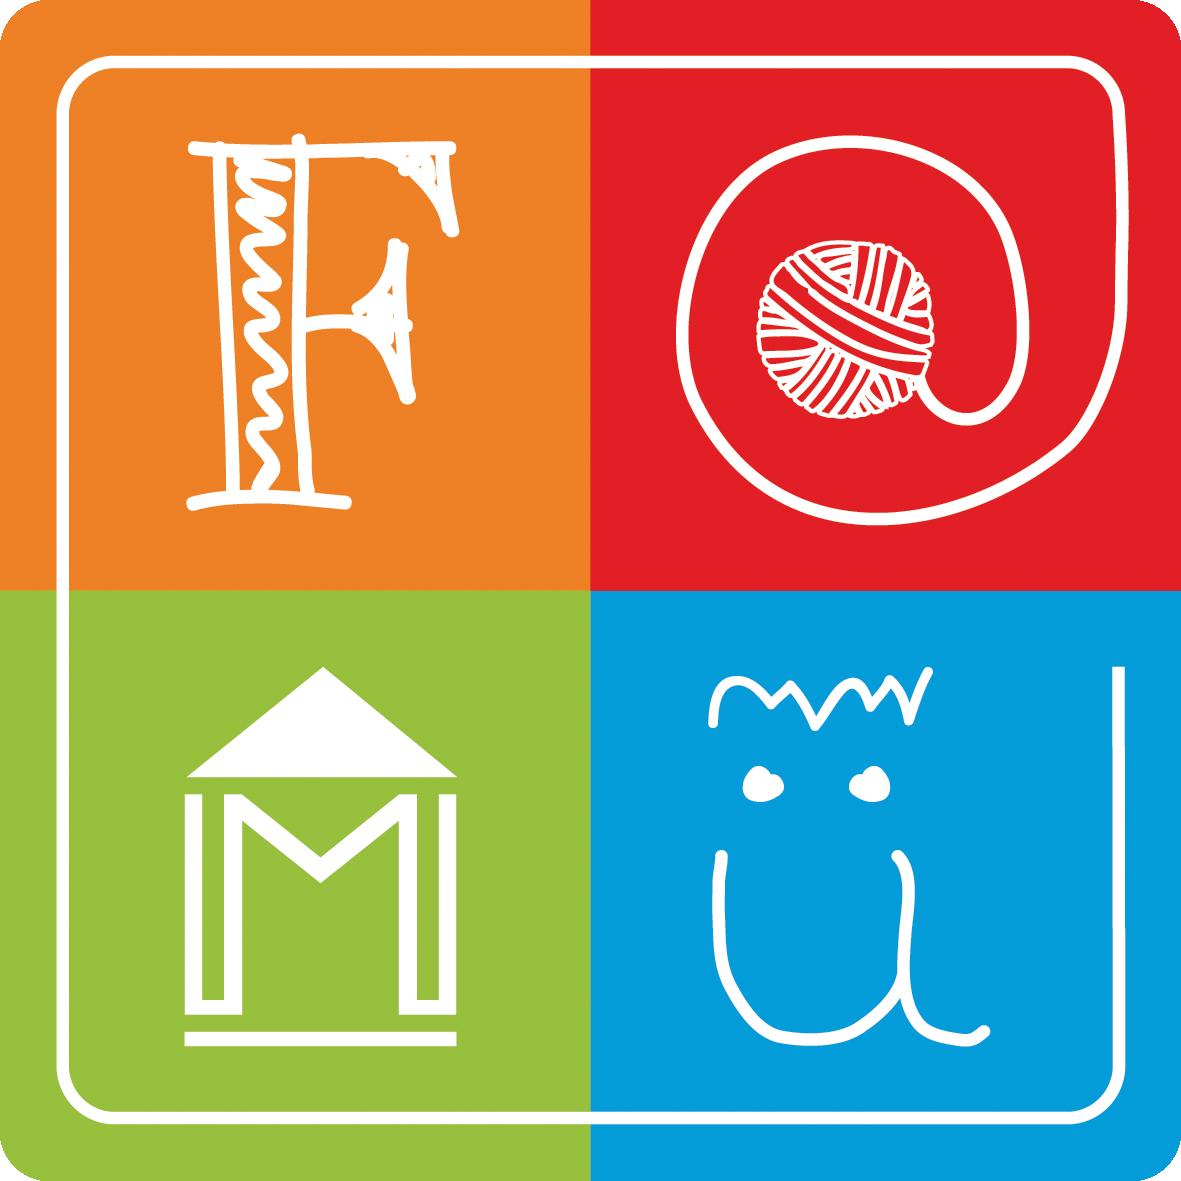 logo_fmu-_-obbligatorio